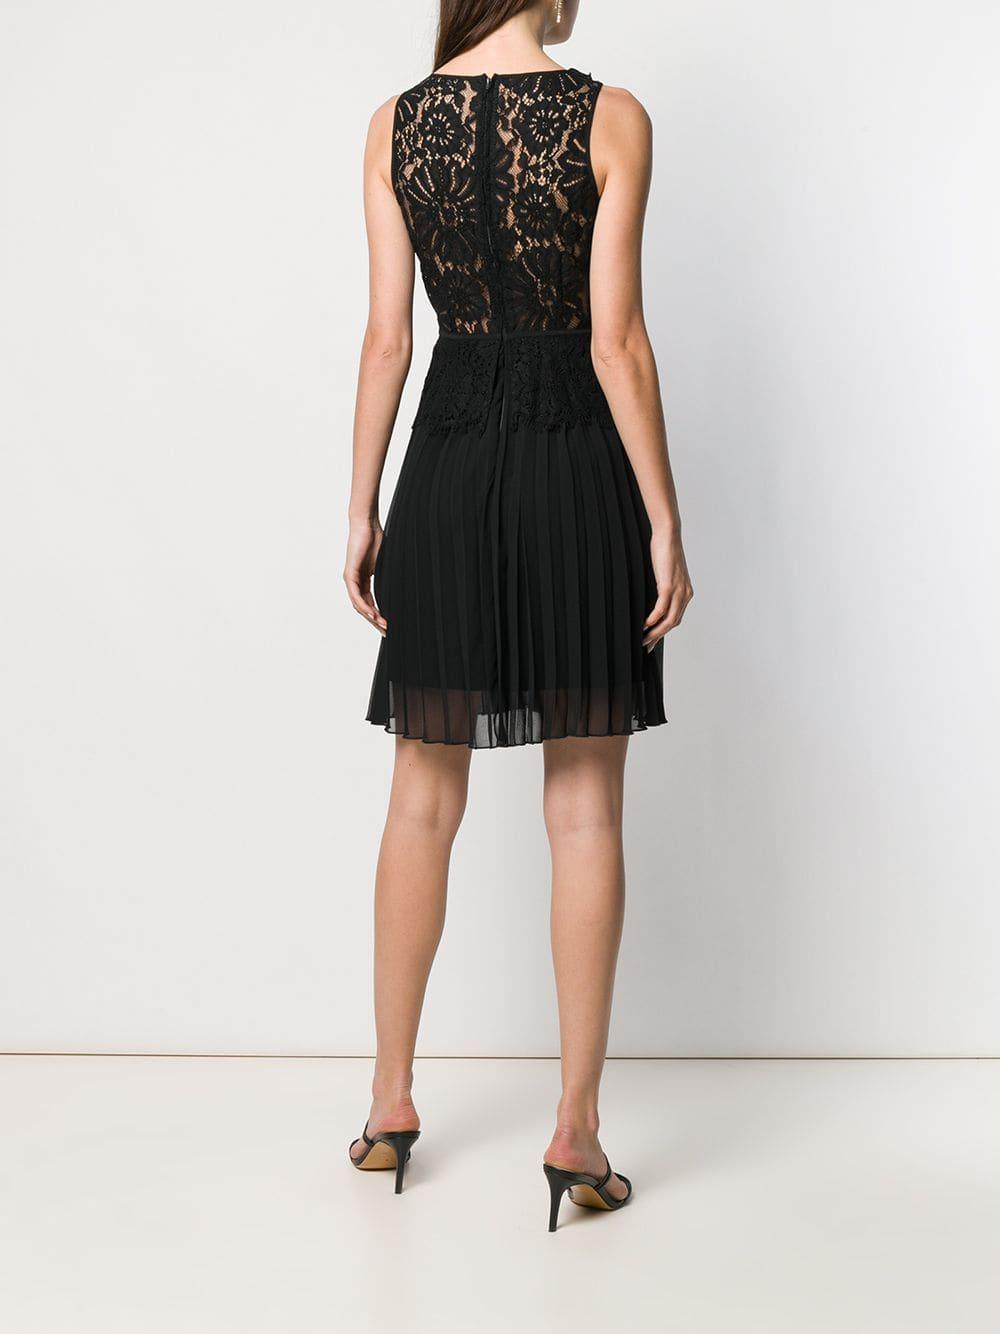 f9540d75e761 Liu Jo Paradise Seduction Dress in Black - Lyst